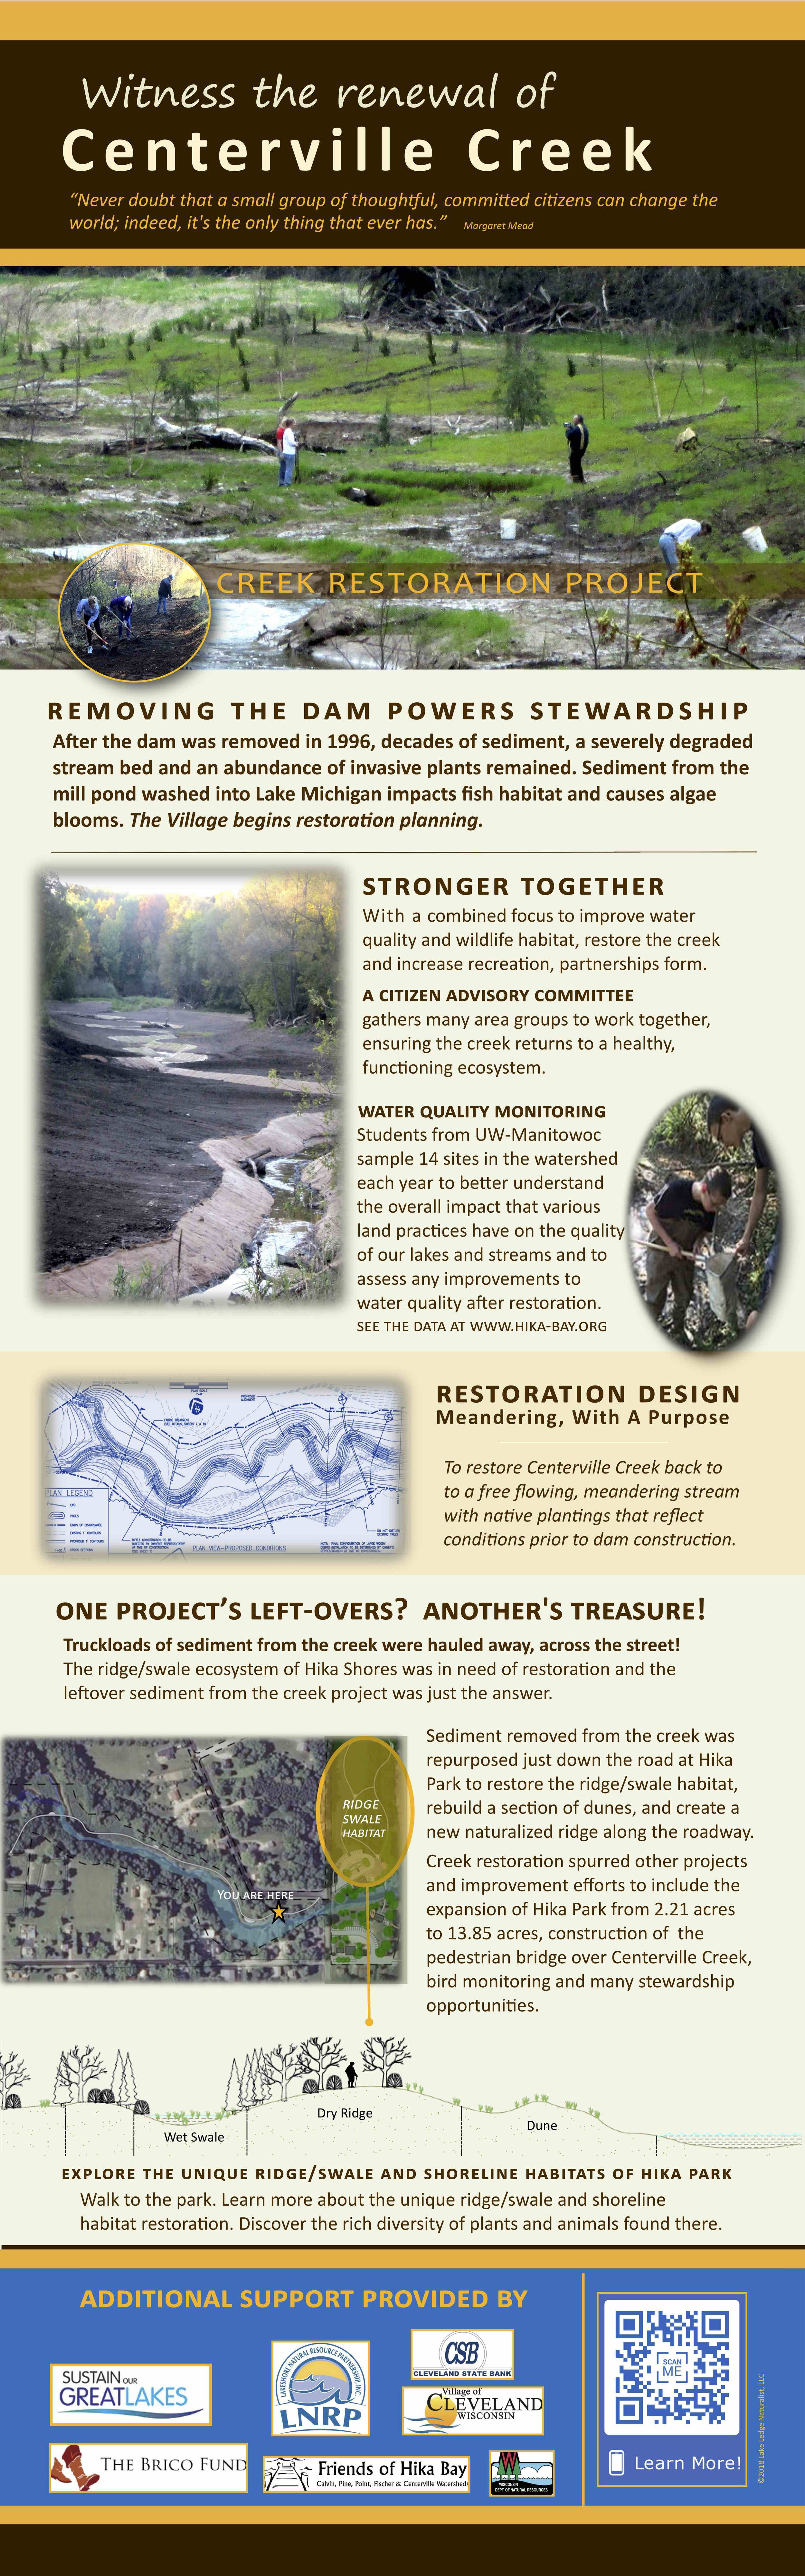 Centerville Creek Restoration Project